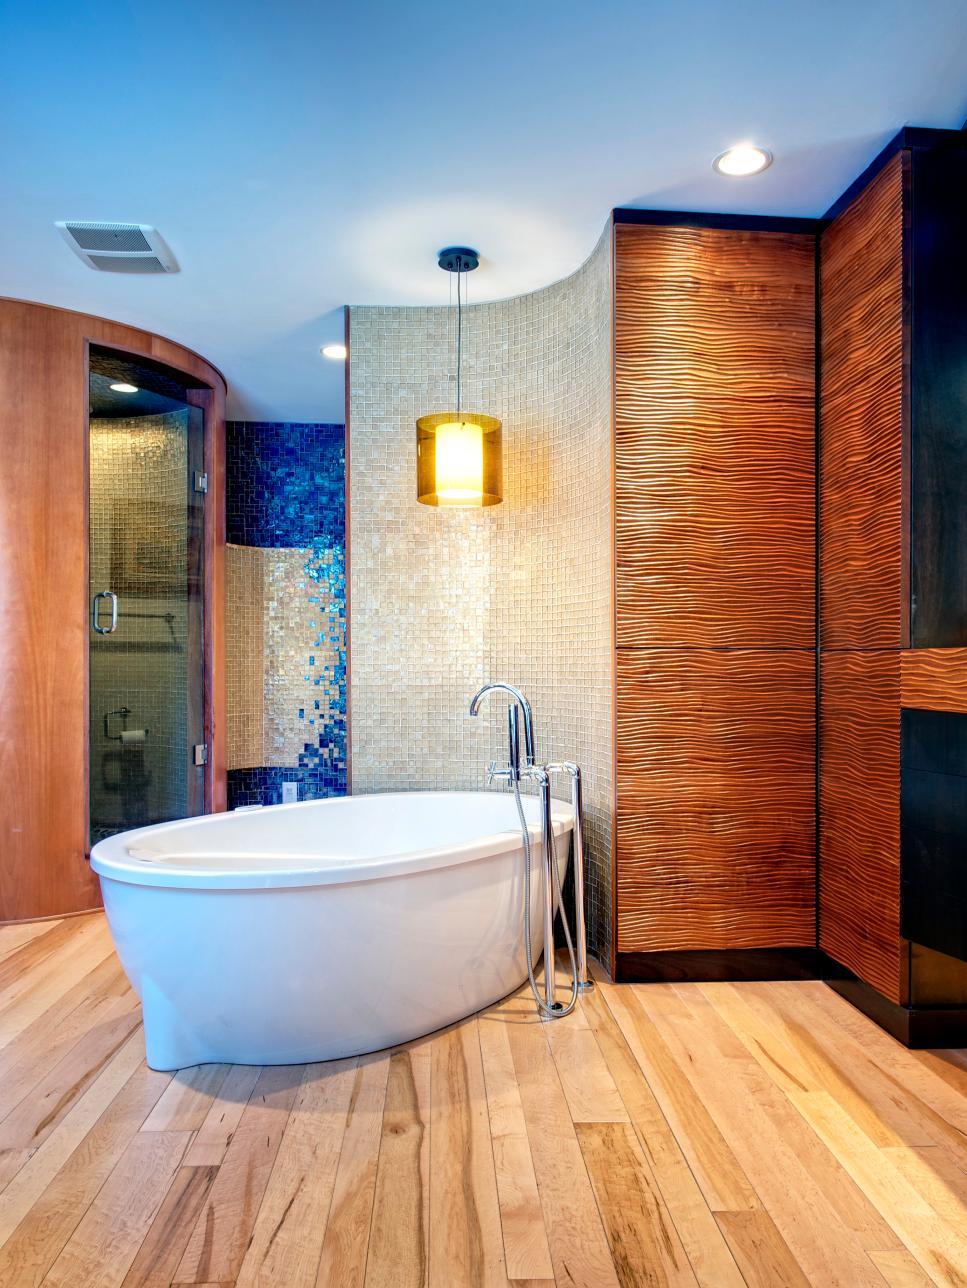 20 Ideas for Bathroom Wall Color | DIY